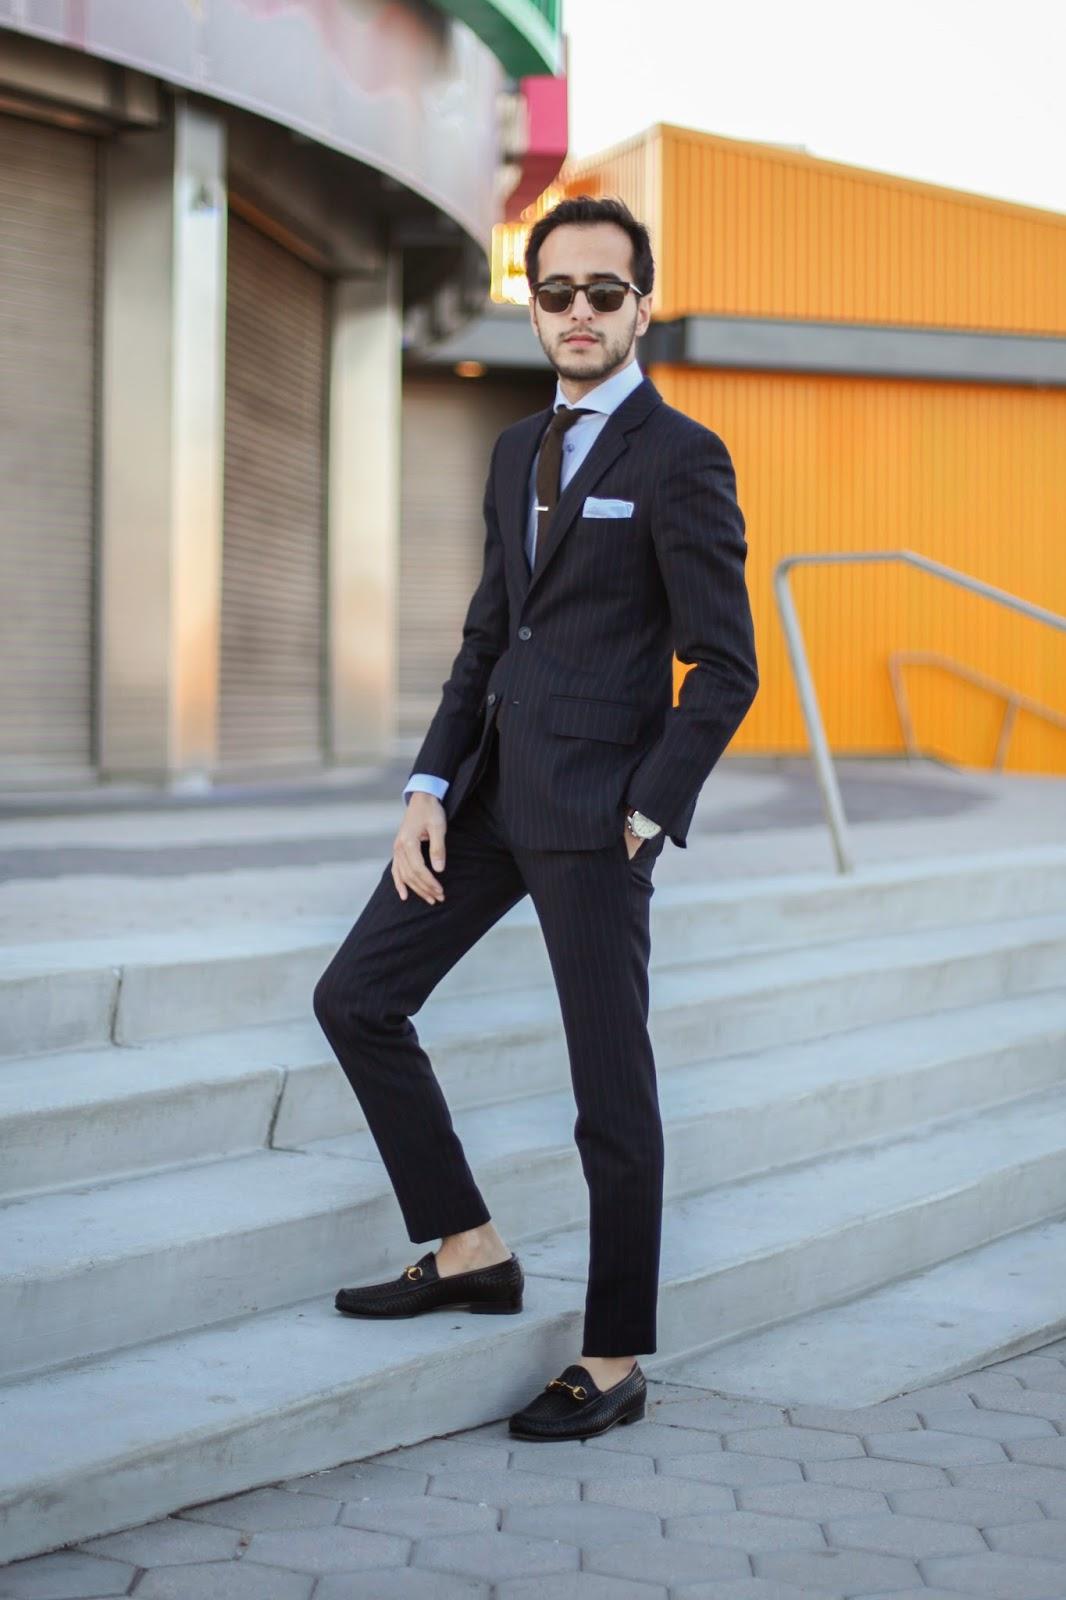 Born To Tailor Bespoke Custom Tailor Suits New York Varun Gandhi 1.JPG